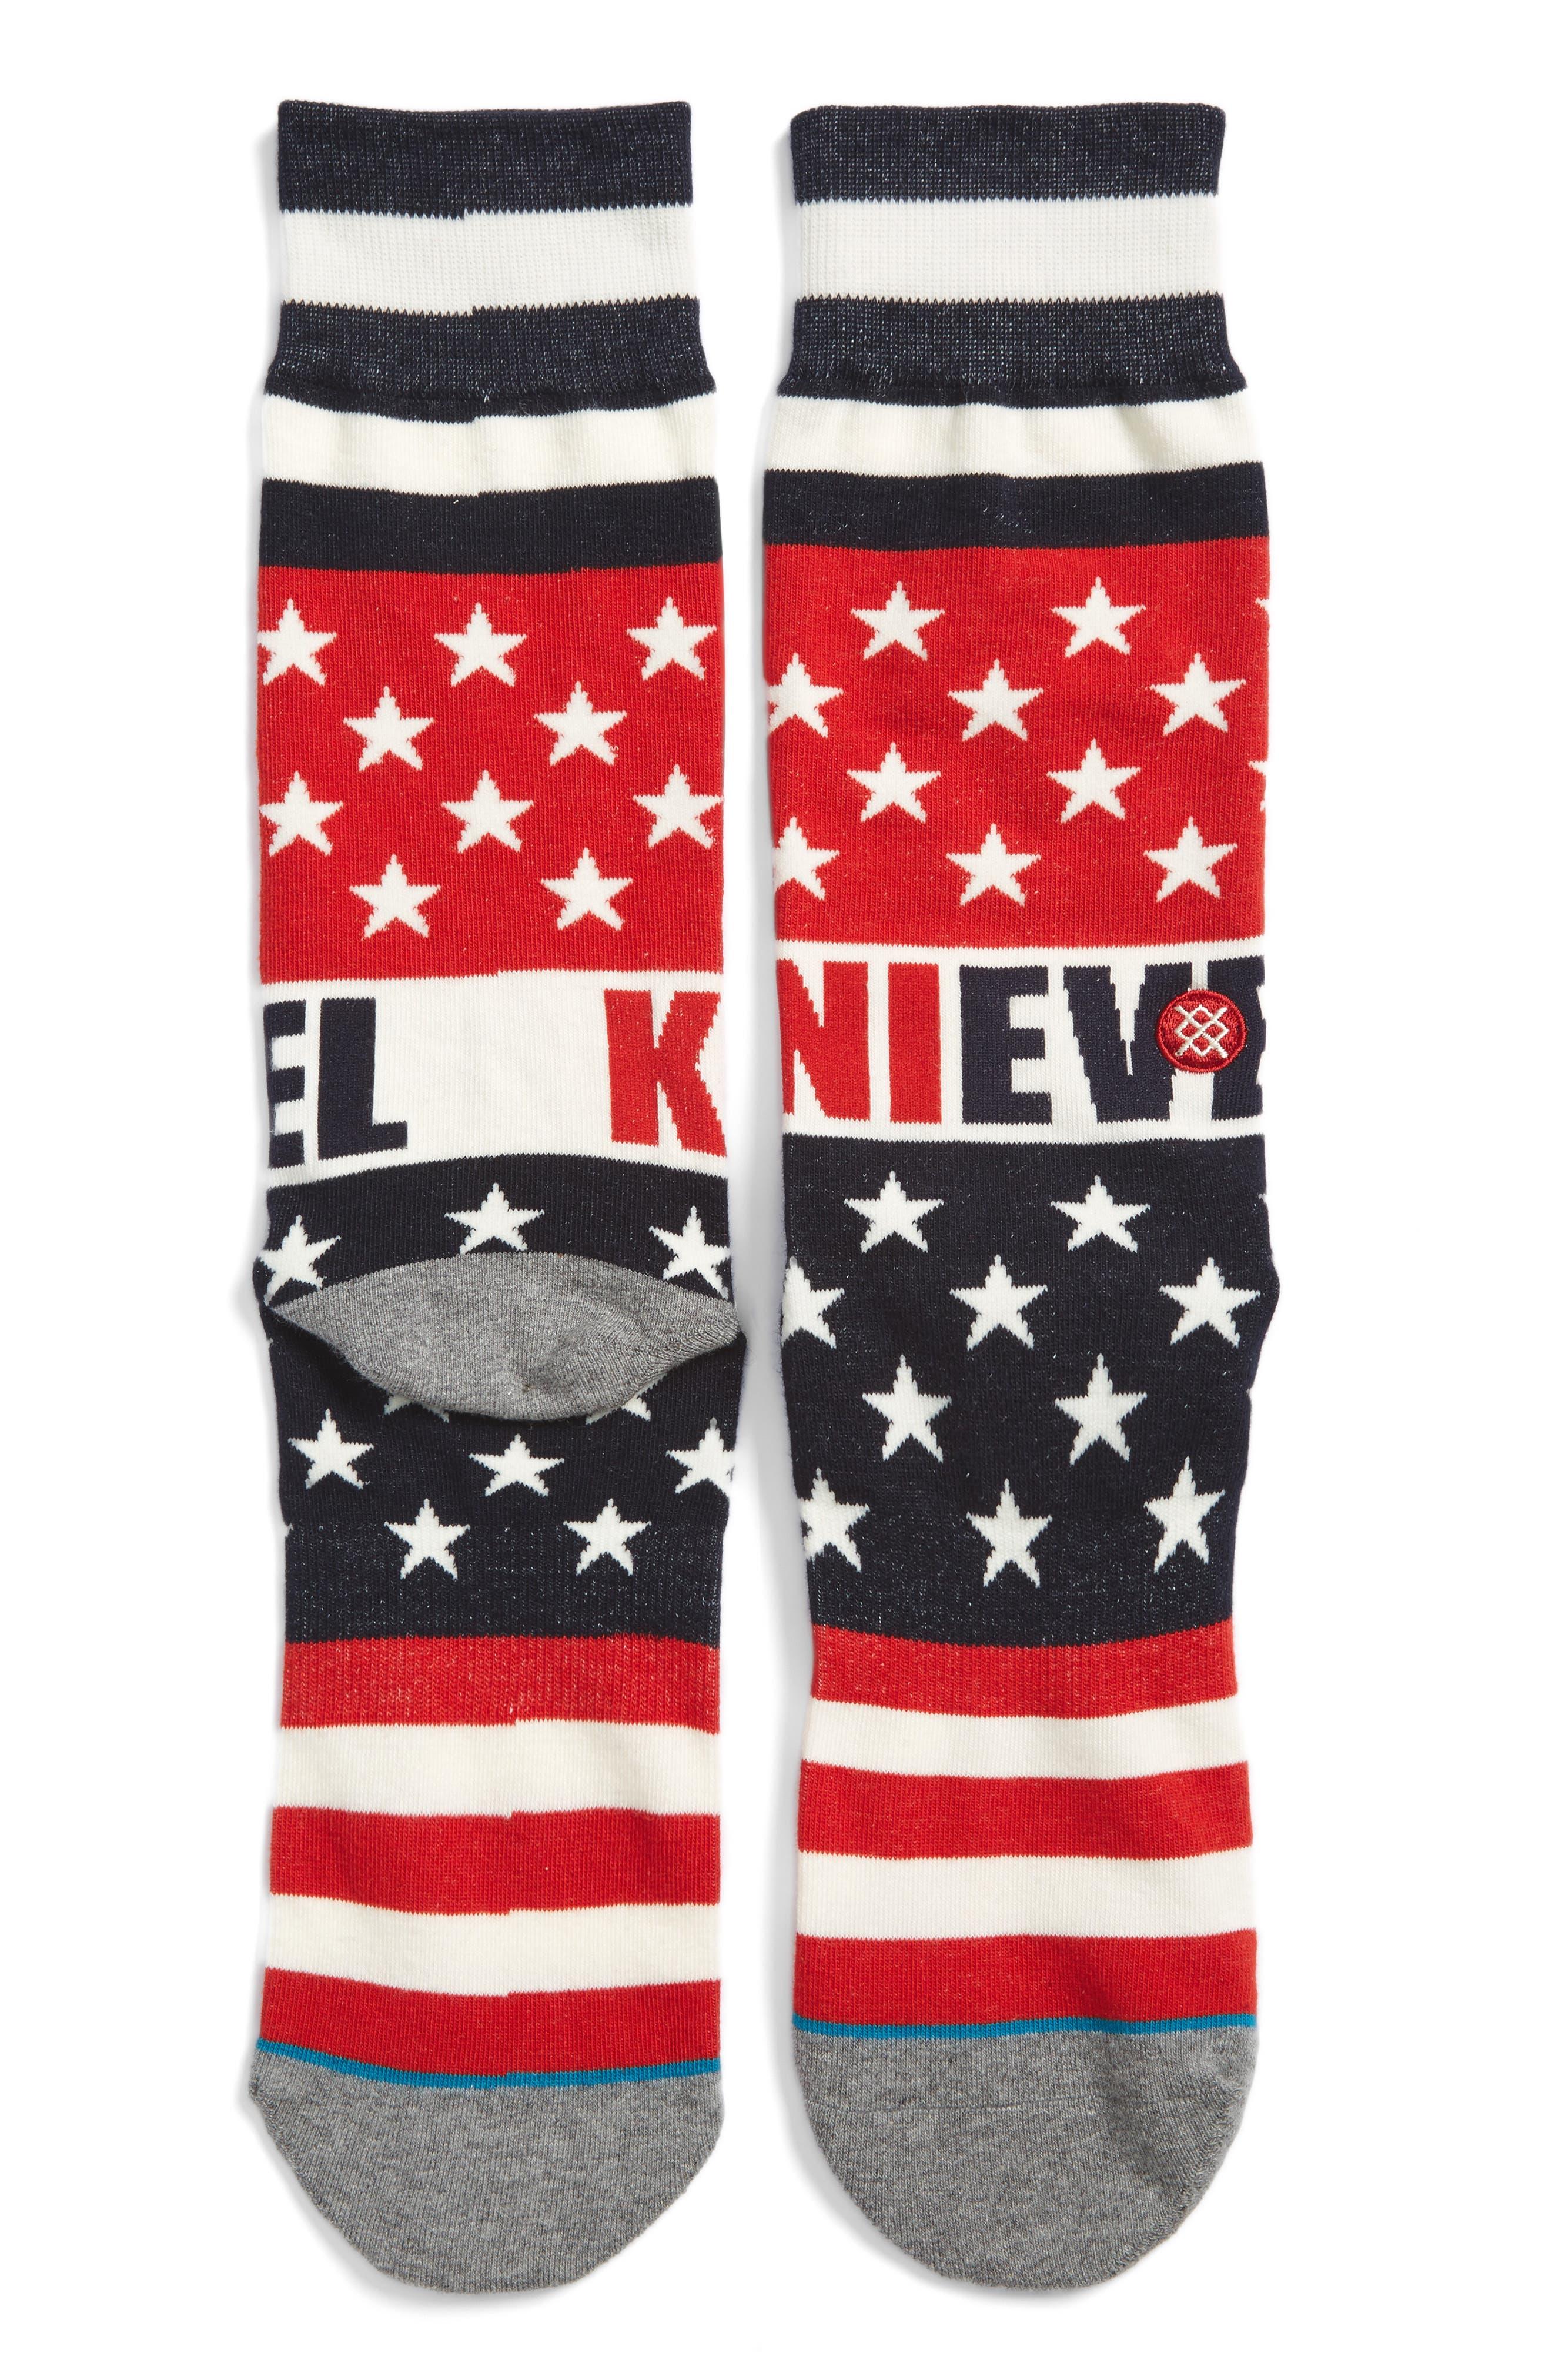 Main Image - Evel Knievel x Stance Gladiator Socks